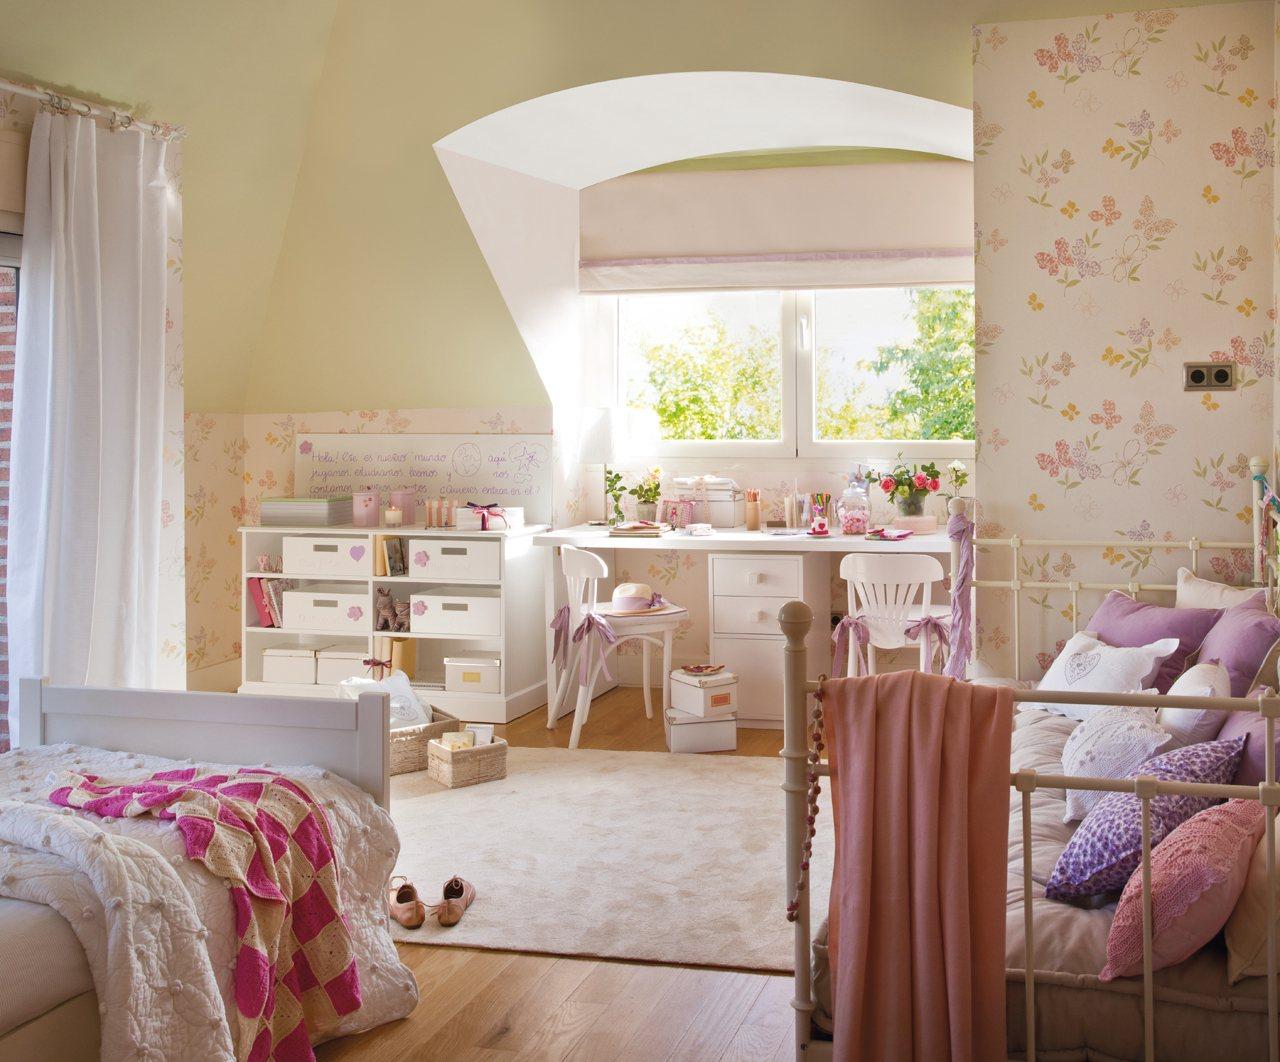 Детская комната в стиле прованс с цветами